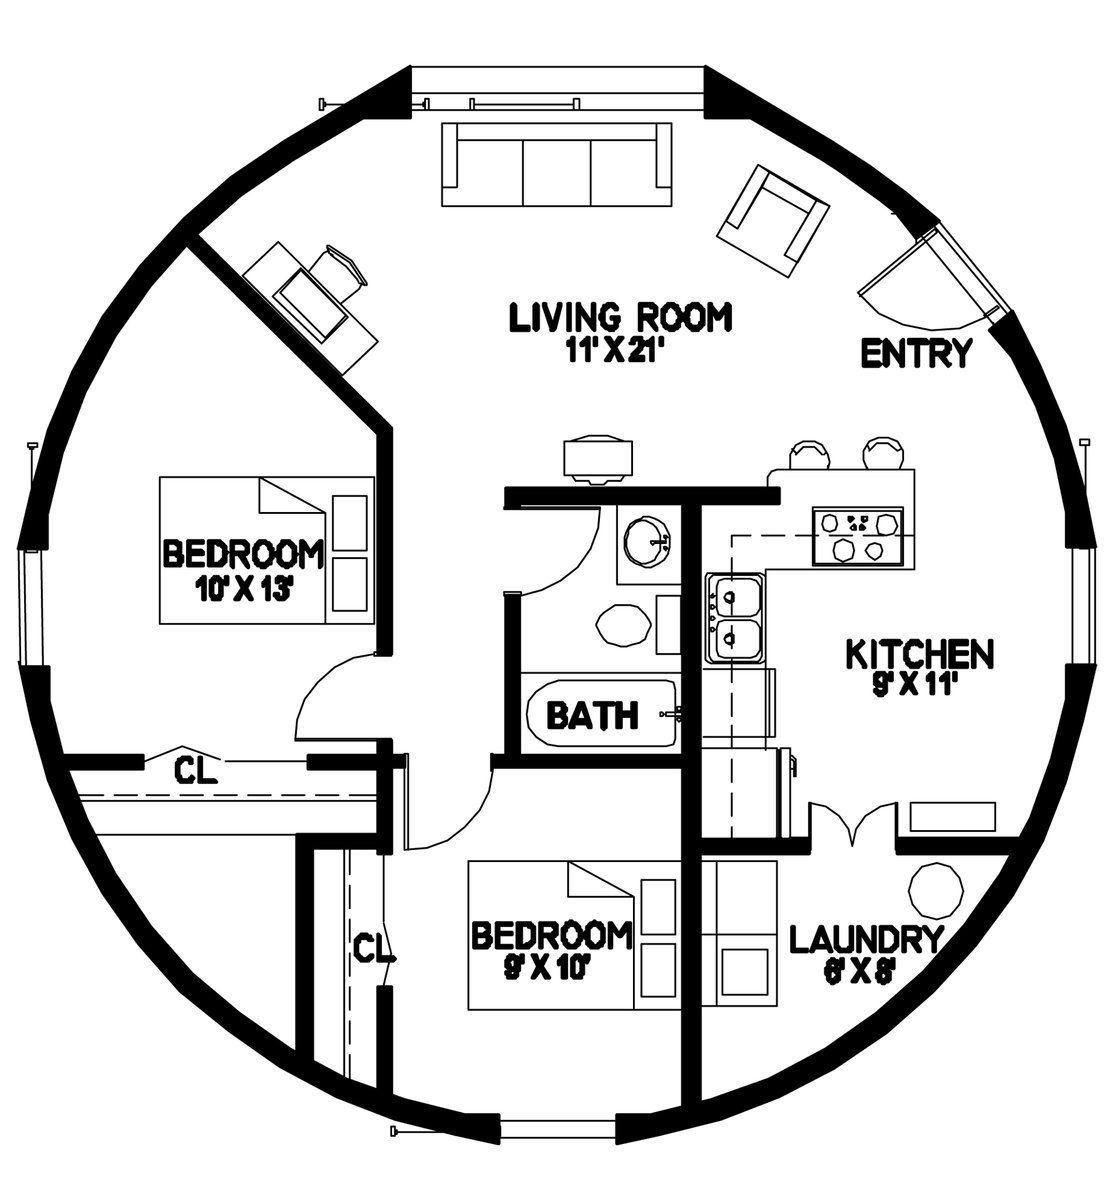 Plan number dl3202 floor area 804 square feet diameter 32 2 bedroom